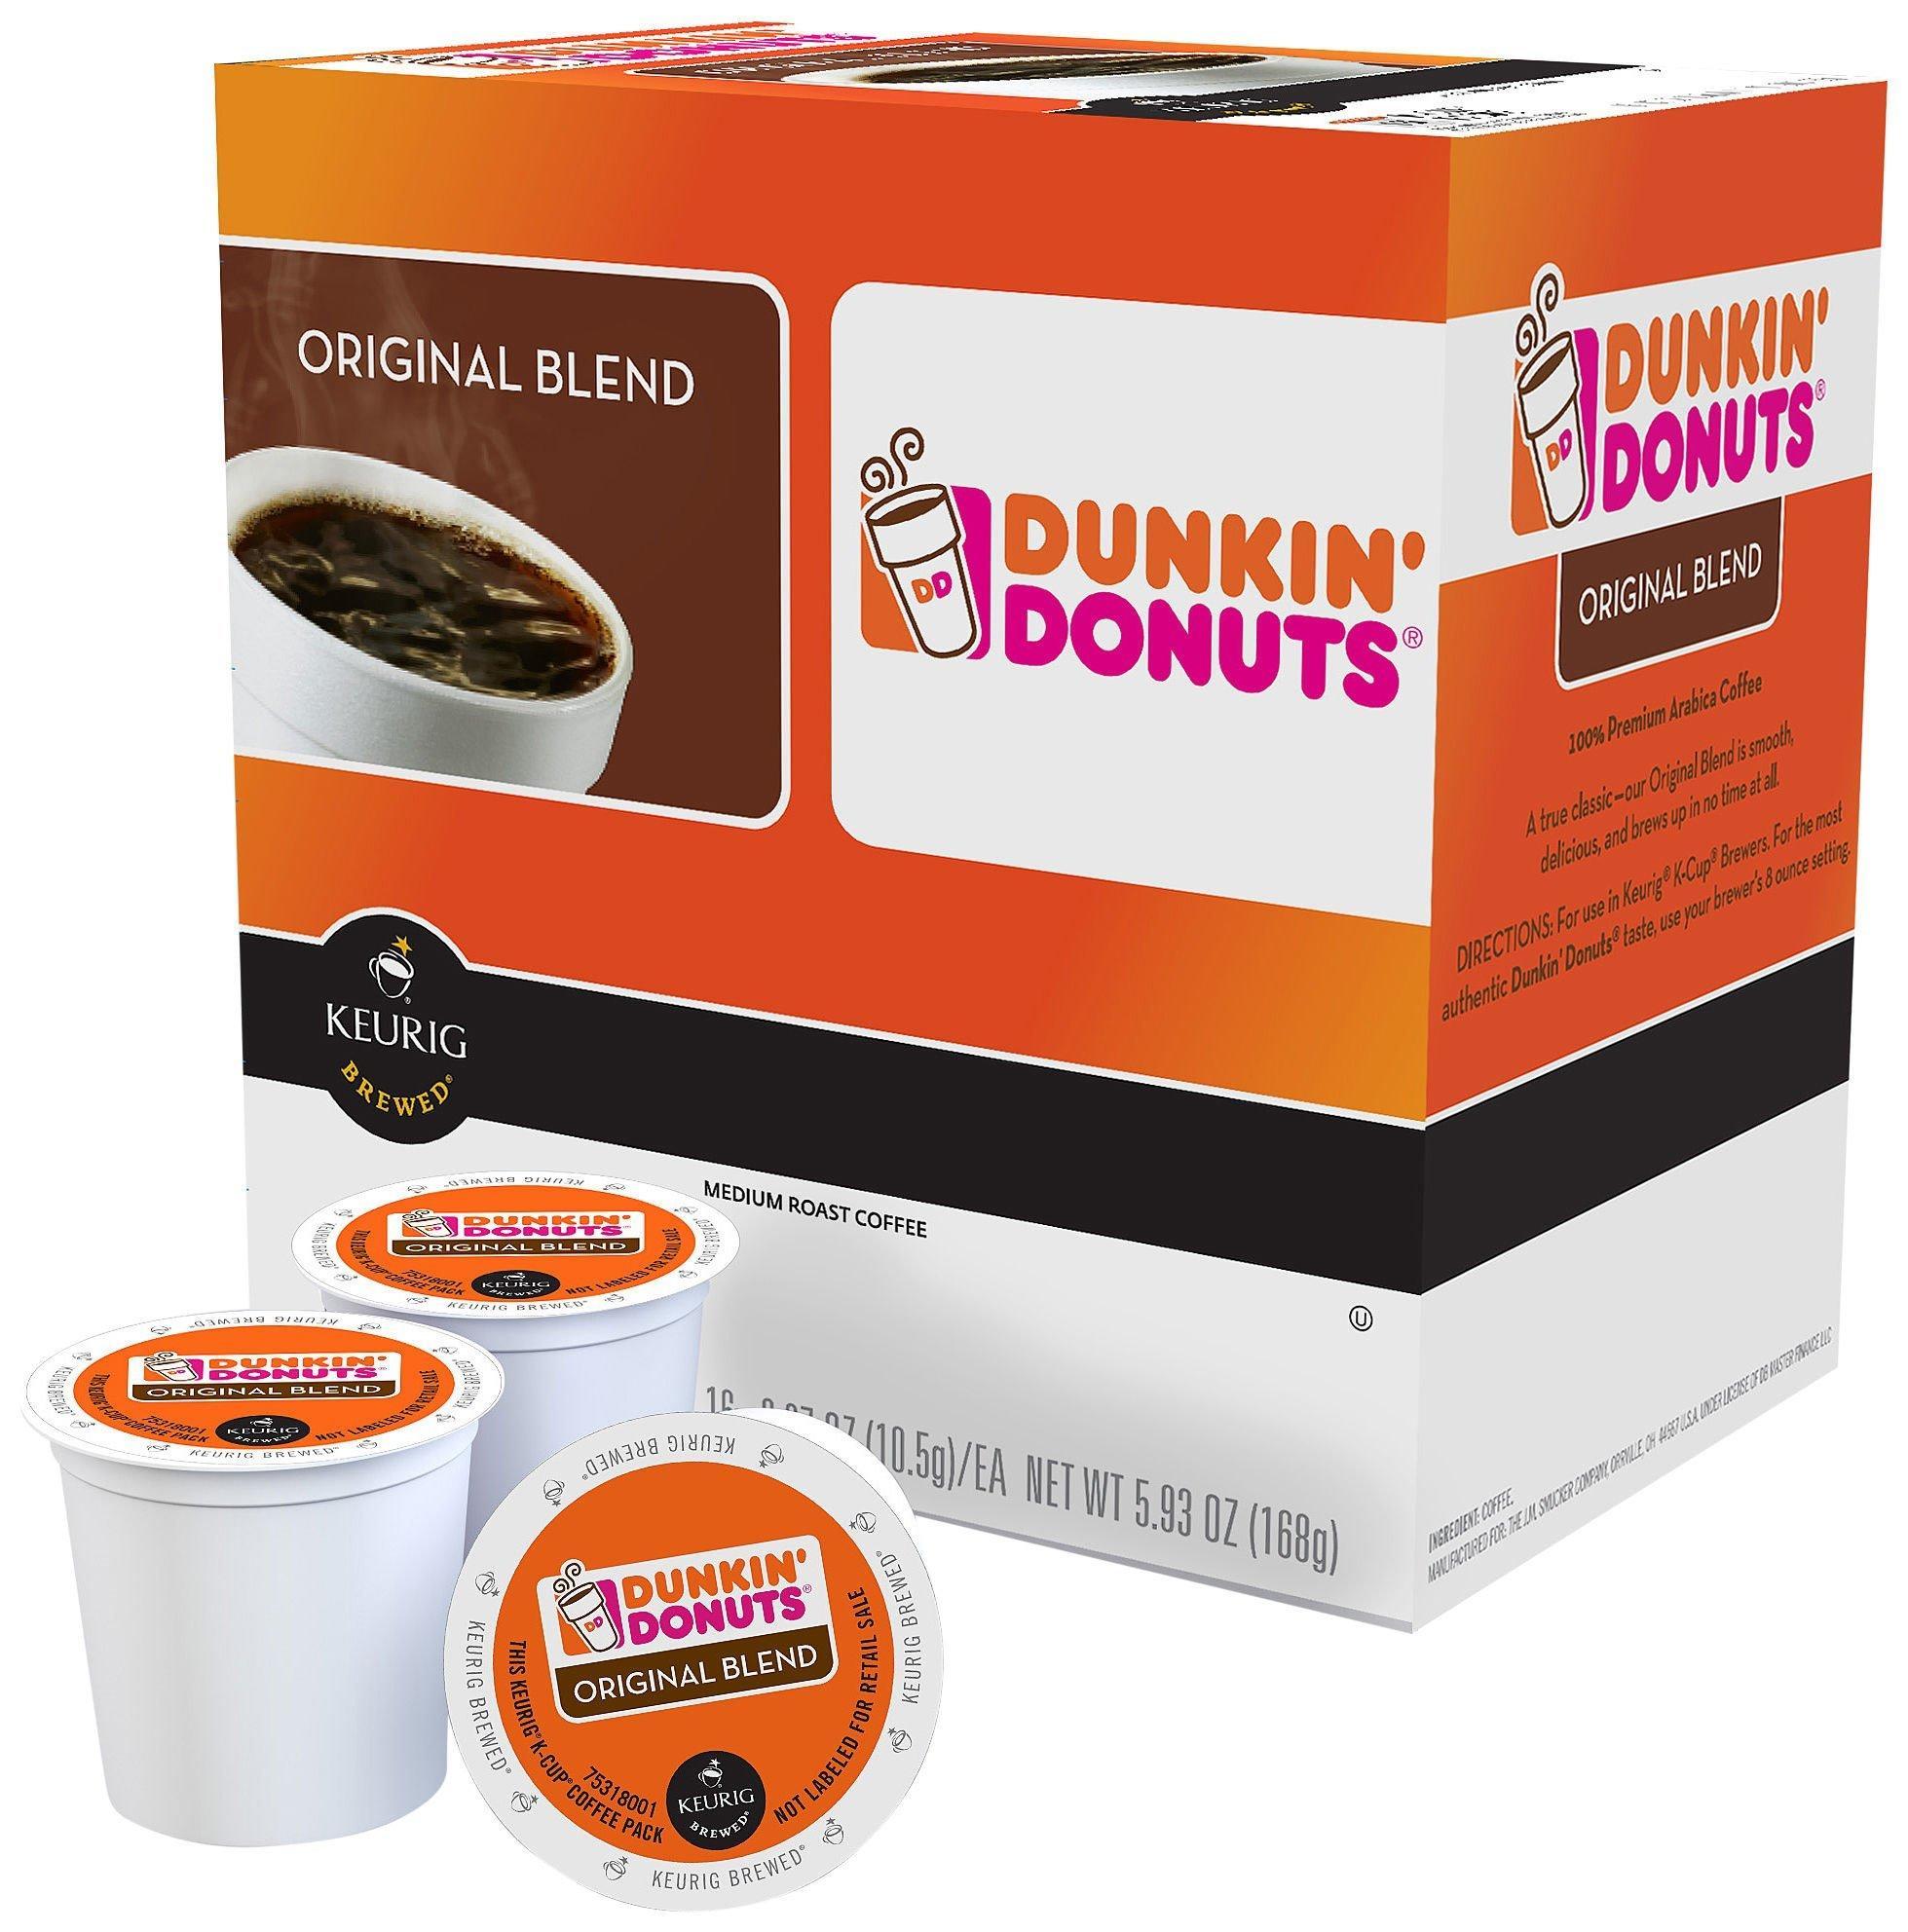 Keurig KCup Dunkin Donuts Original Blend 16 pk